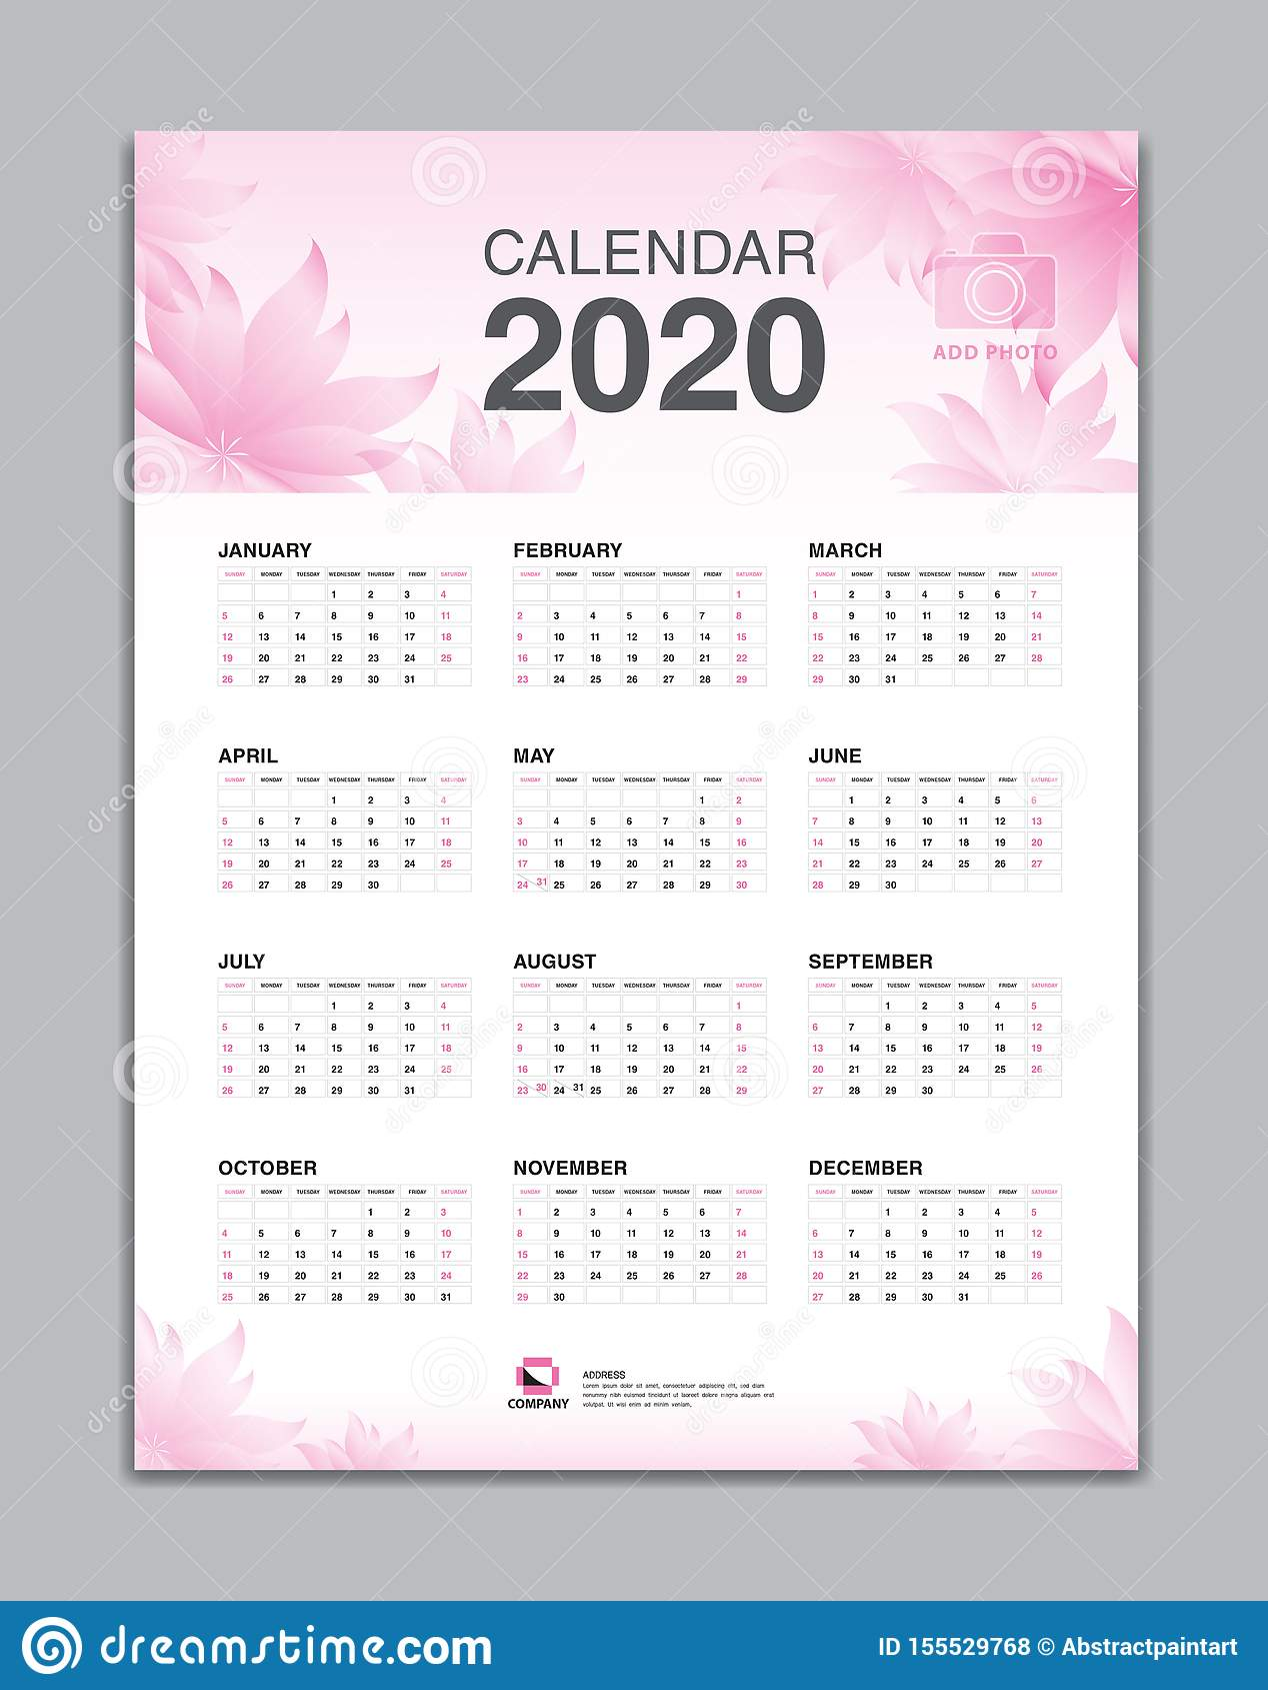 Calendar 15 Template, Wall Calendar 15 Vector, Desk Calendar